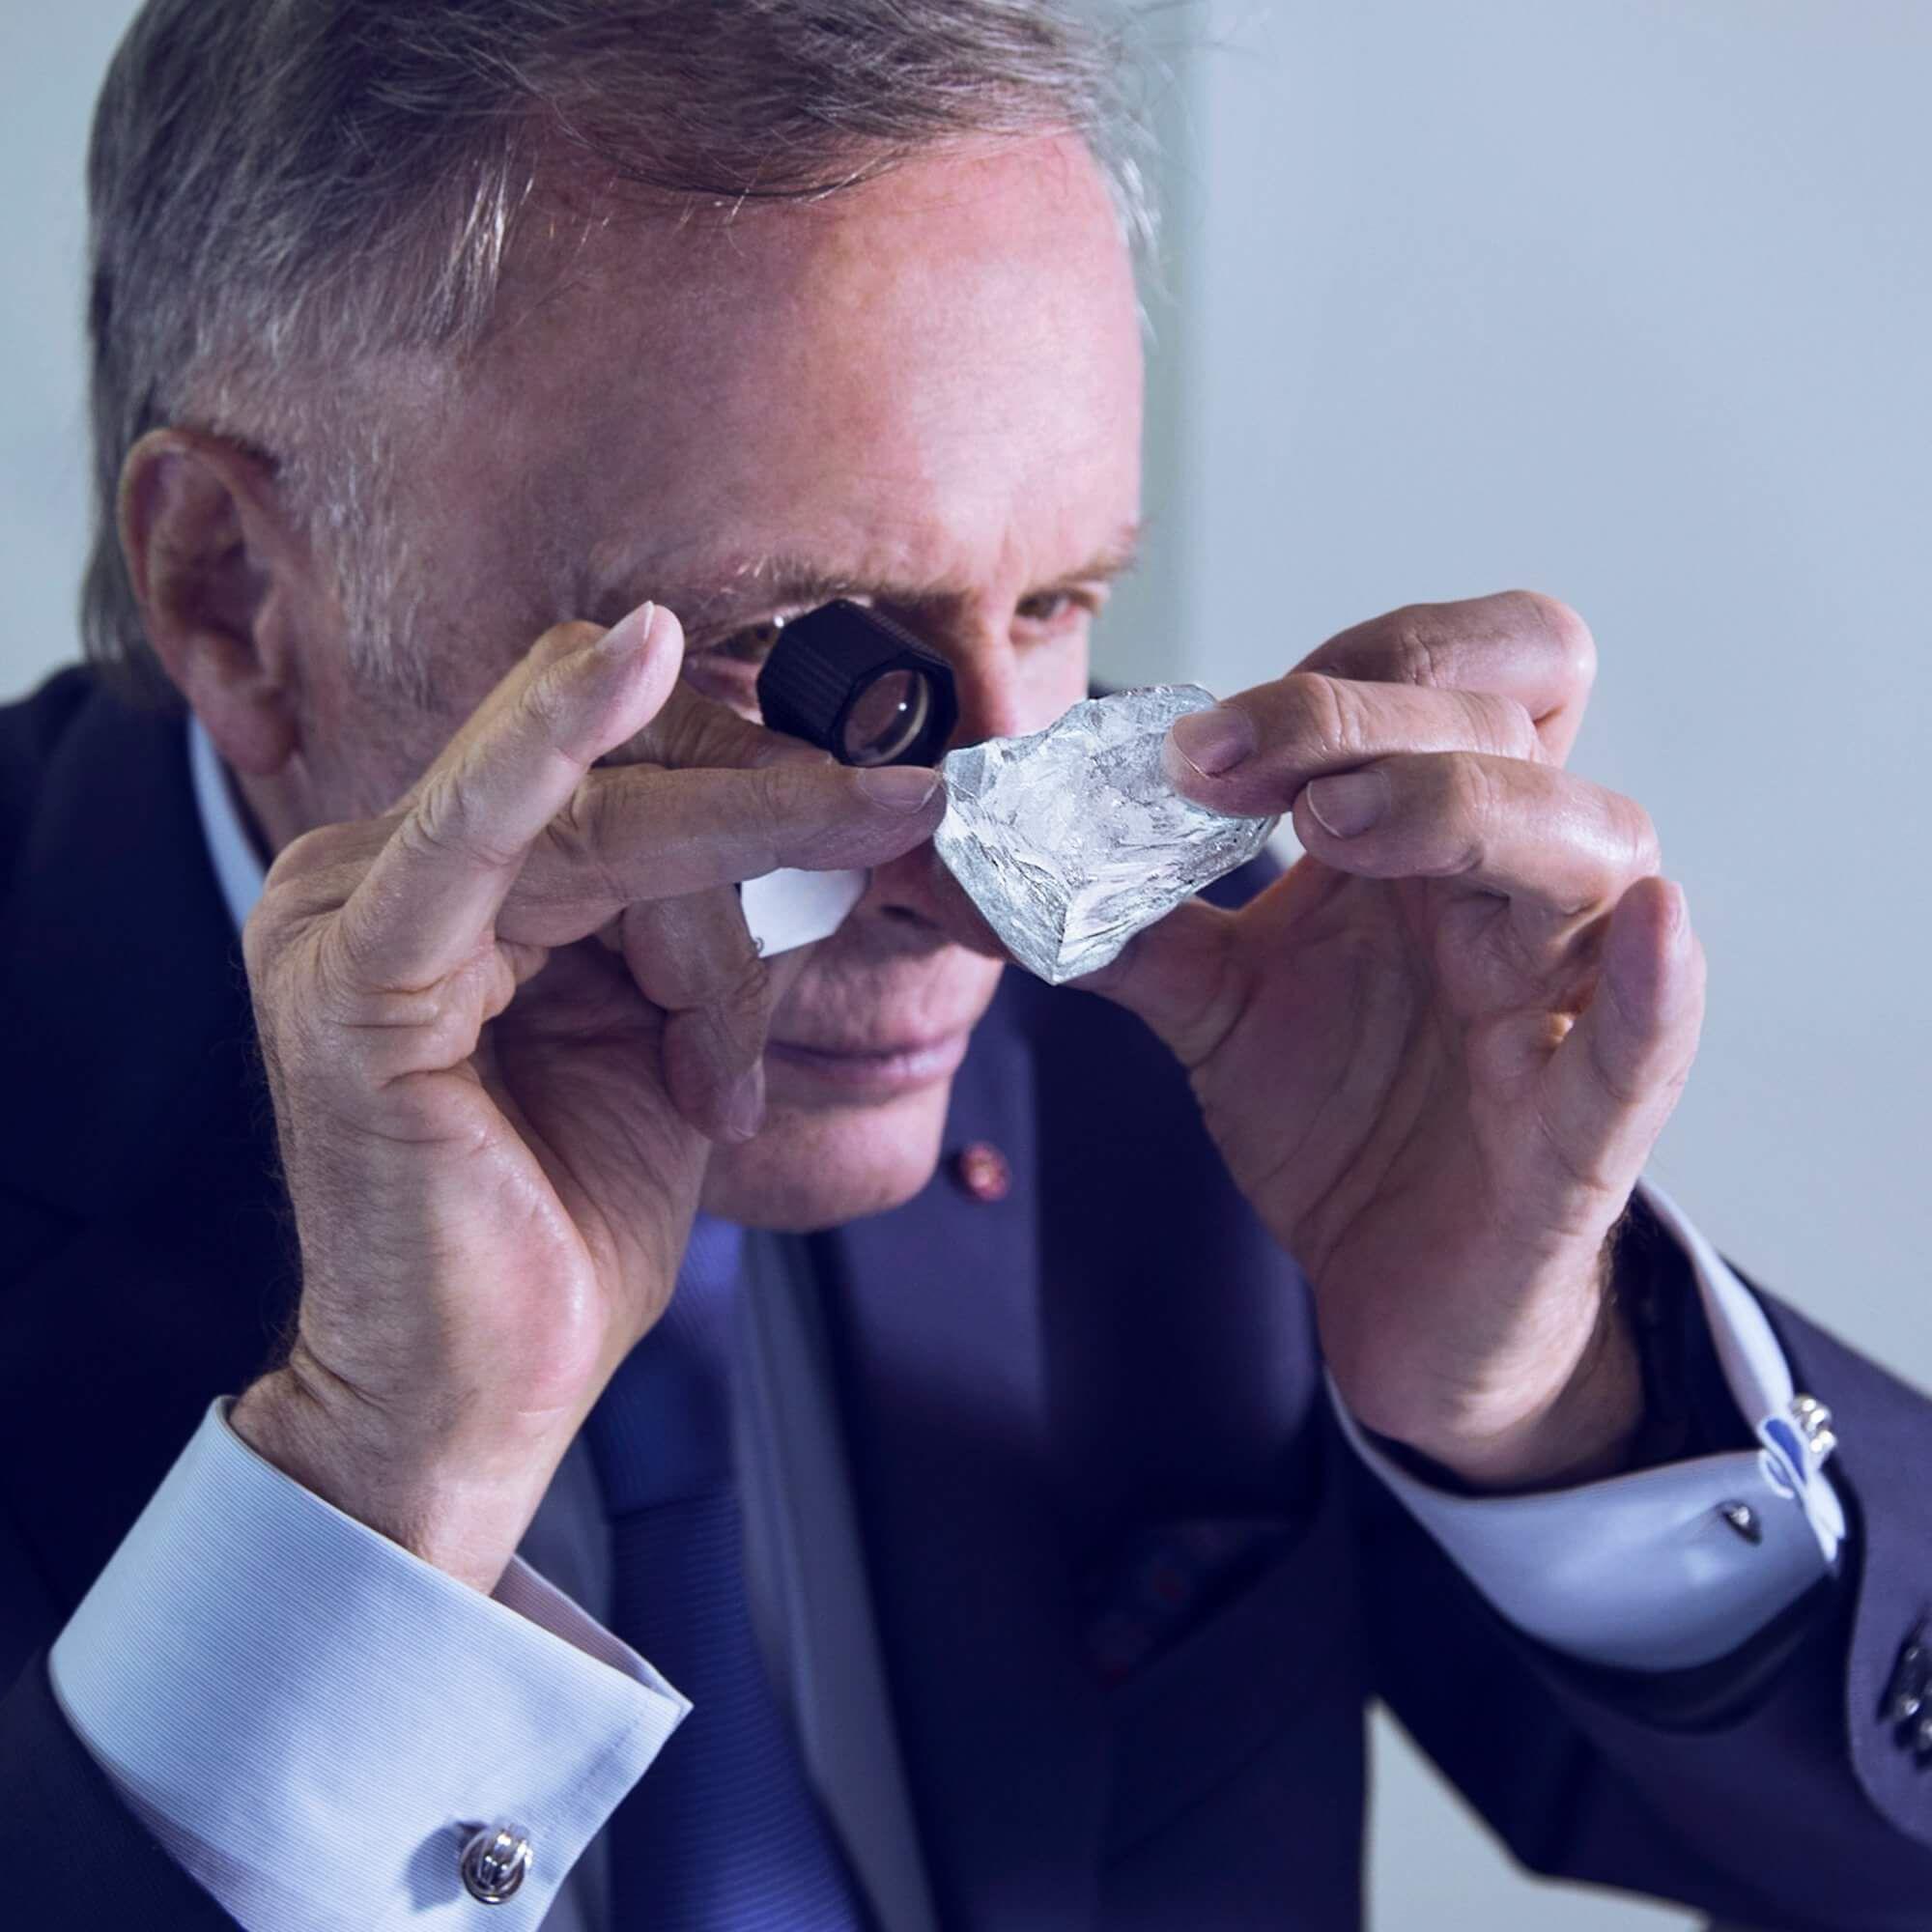 Mr Laurence Graff looking into the Lesedi La Rona rough diamond through a loupe